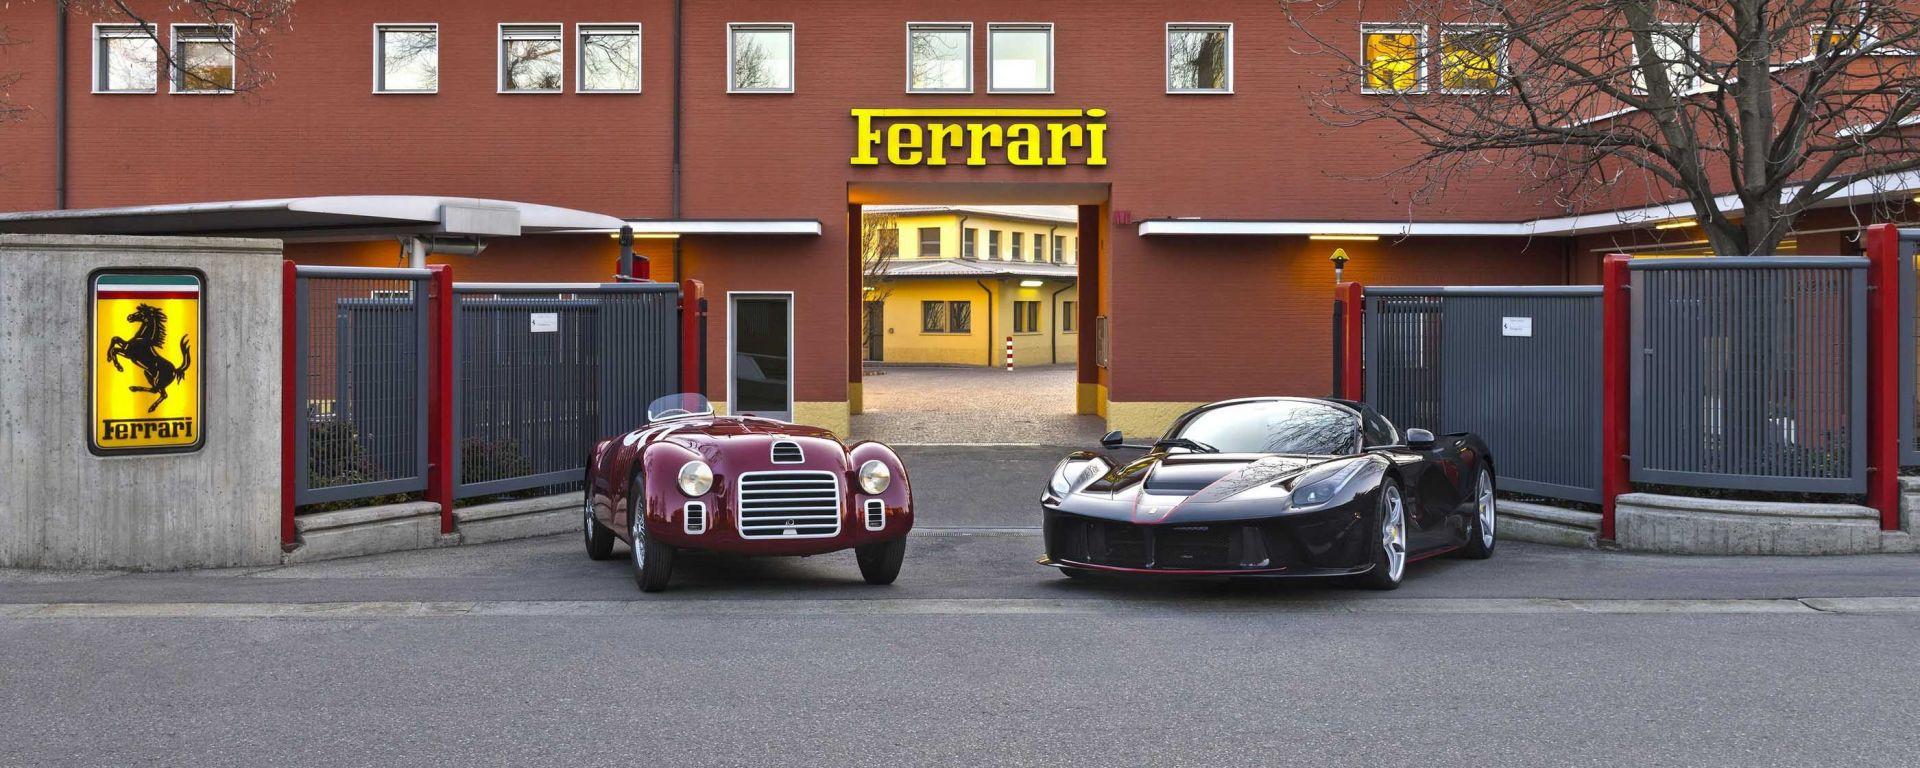 Ferrari compie 70 anni. Tanti auguri Cavallino